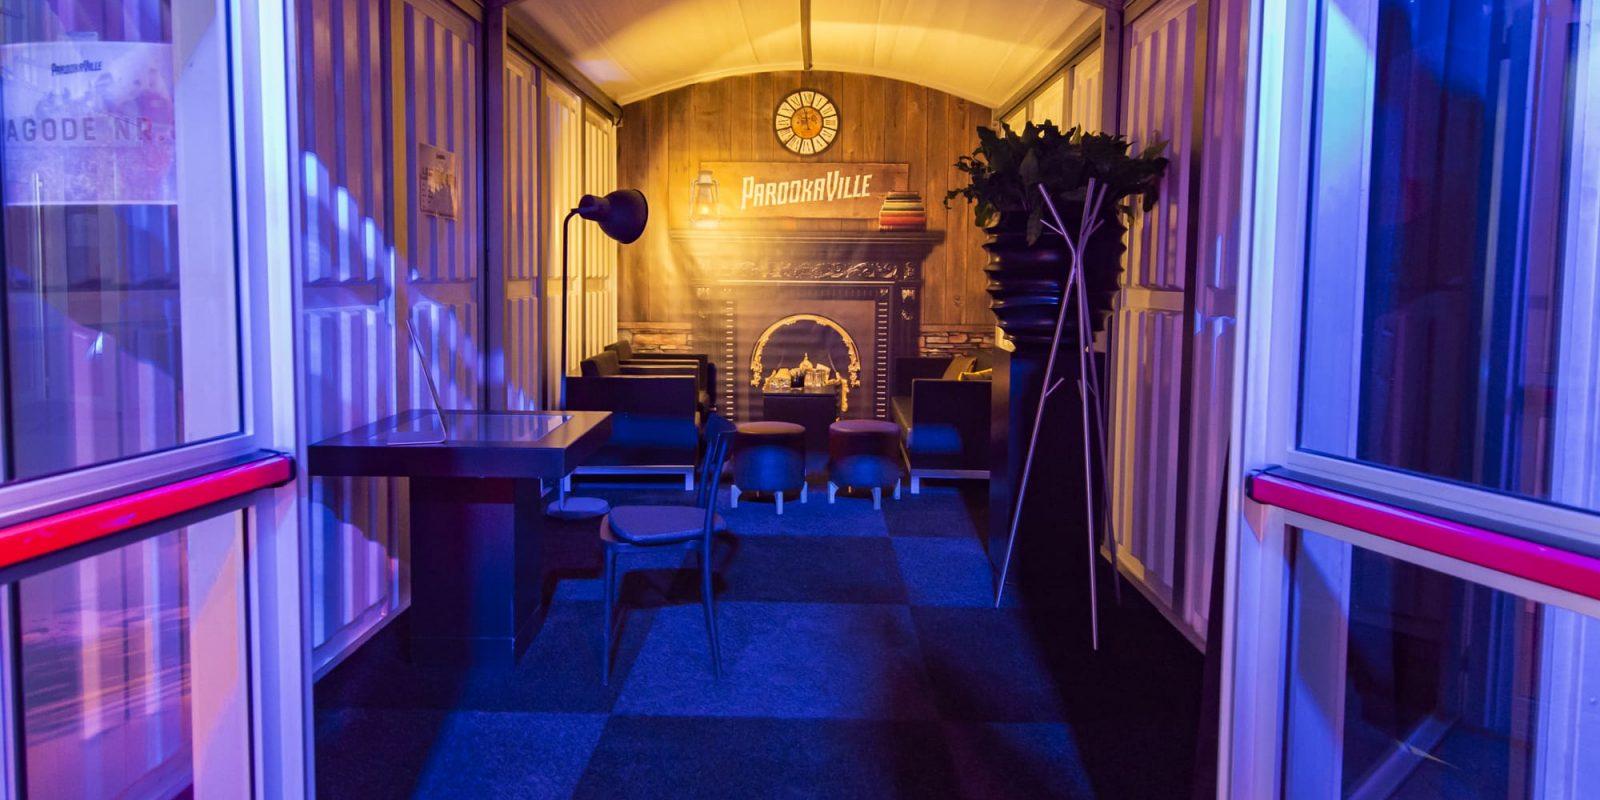 Bas de Boer Eventstyling Parookaville Festival 2019 Backstage Künstlergarderoben Loungemöbel ArtistVillage Backstagebereich www.basdeboer eventstyling.de 098 1600x800 - Parookaville Festival 2019